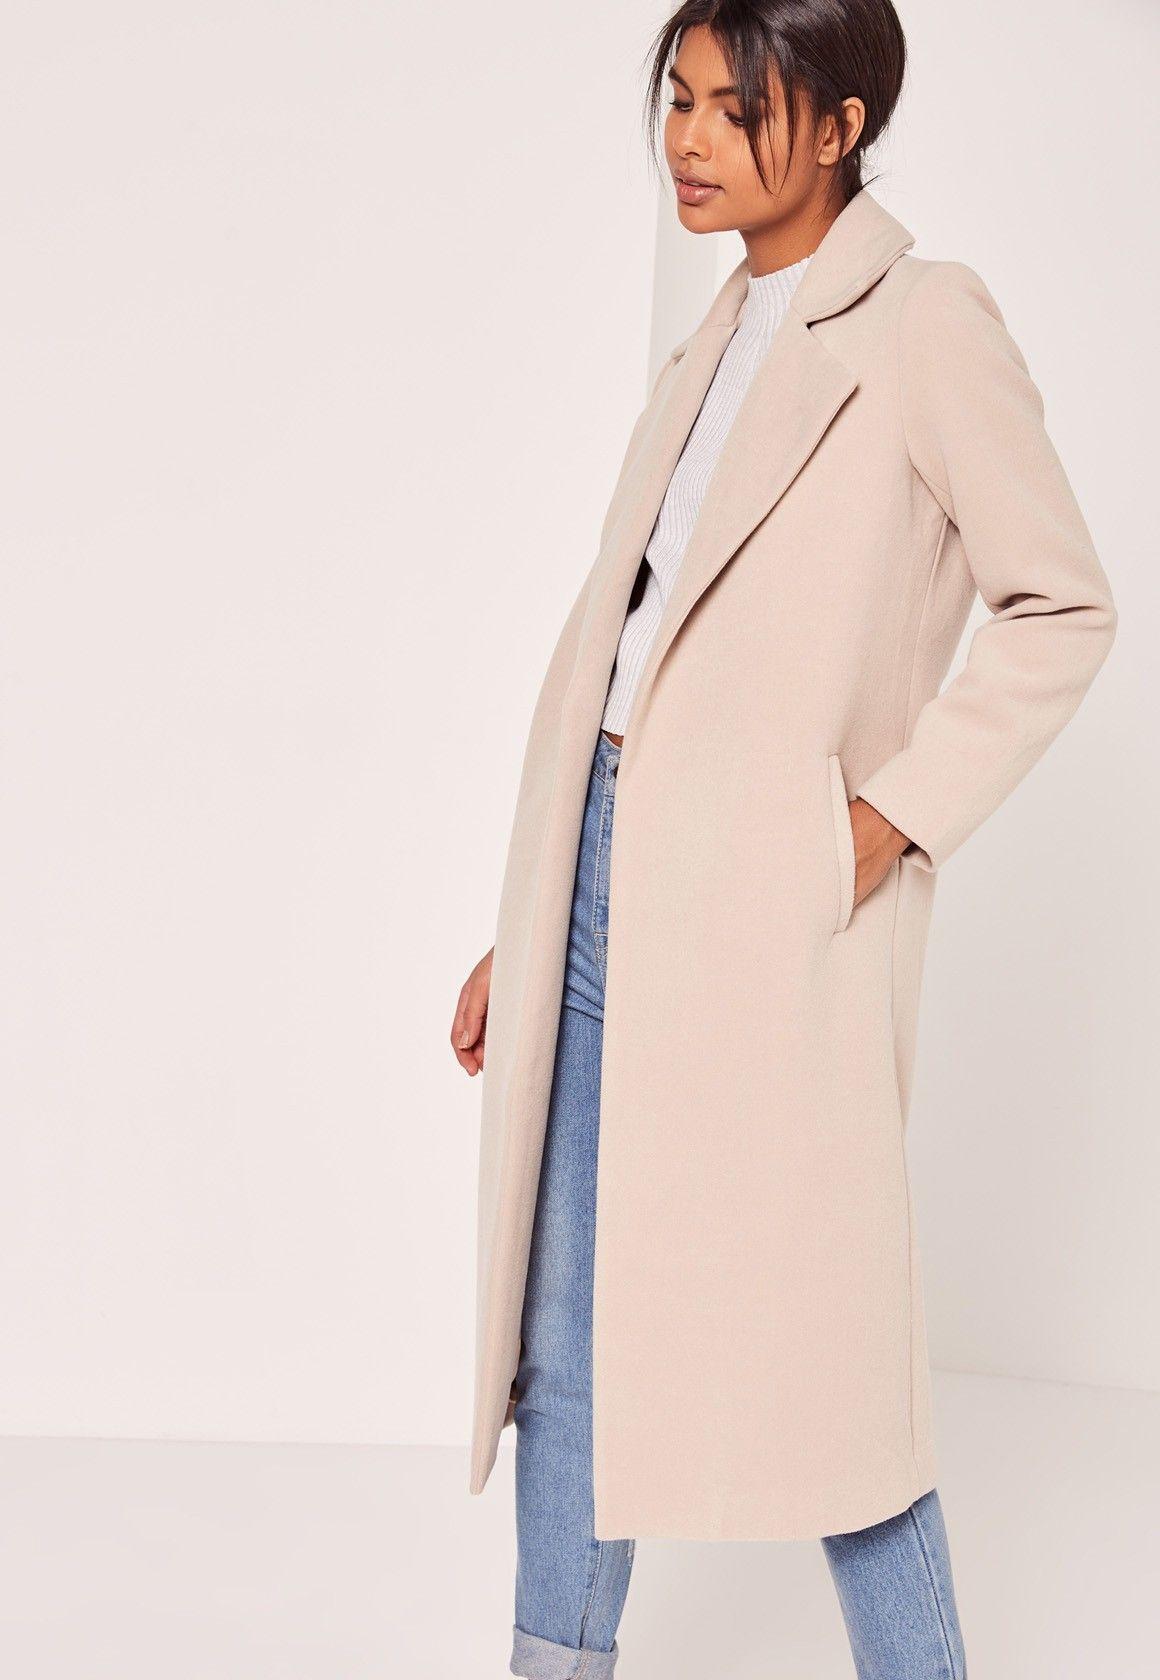 Best Winter Coats For Women 2016 Under 150 Usd Just The Design Coats For Women Coats Jackets Women Best Winter Coats